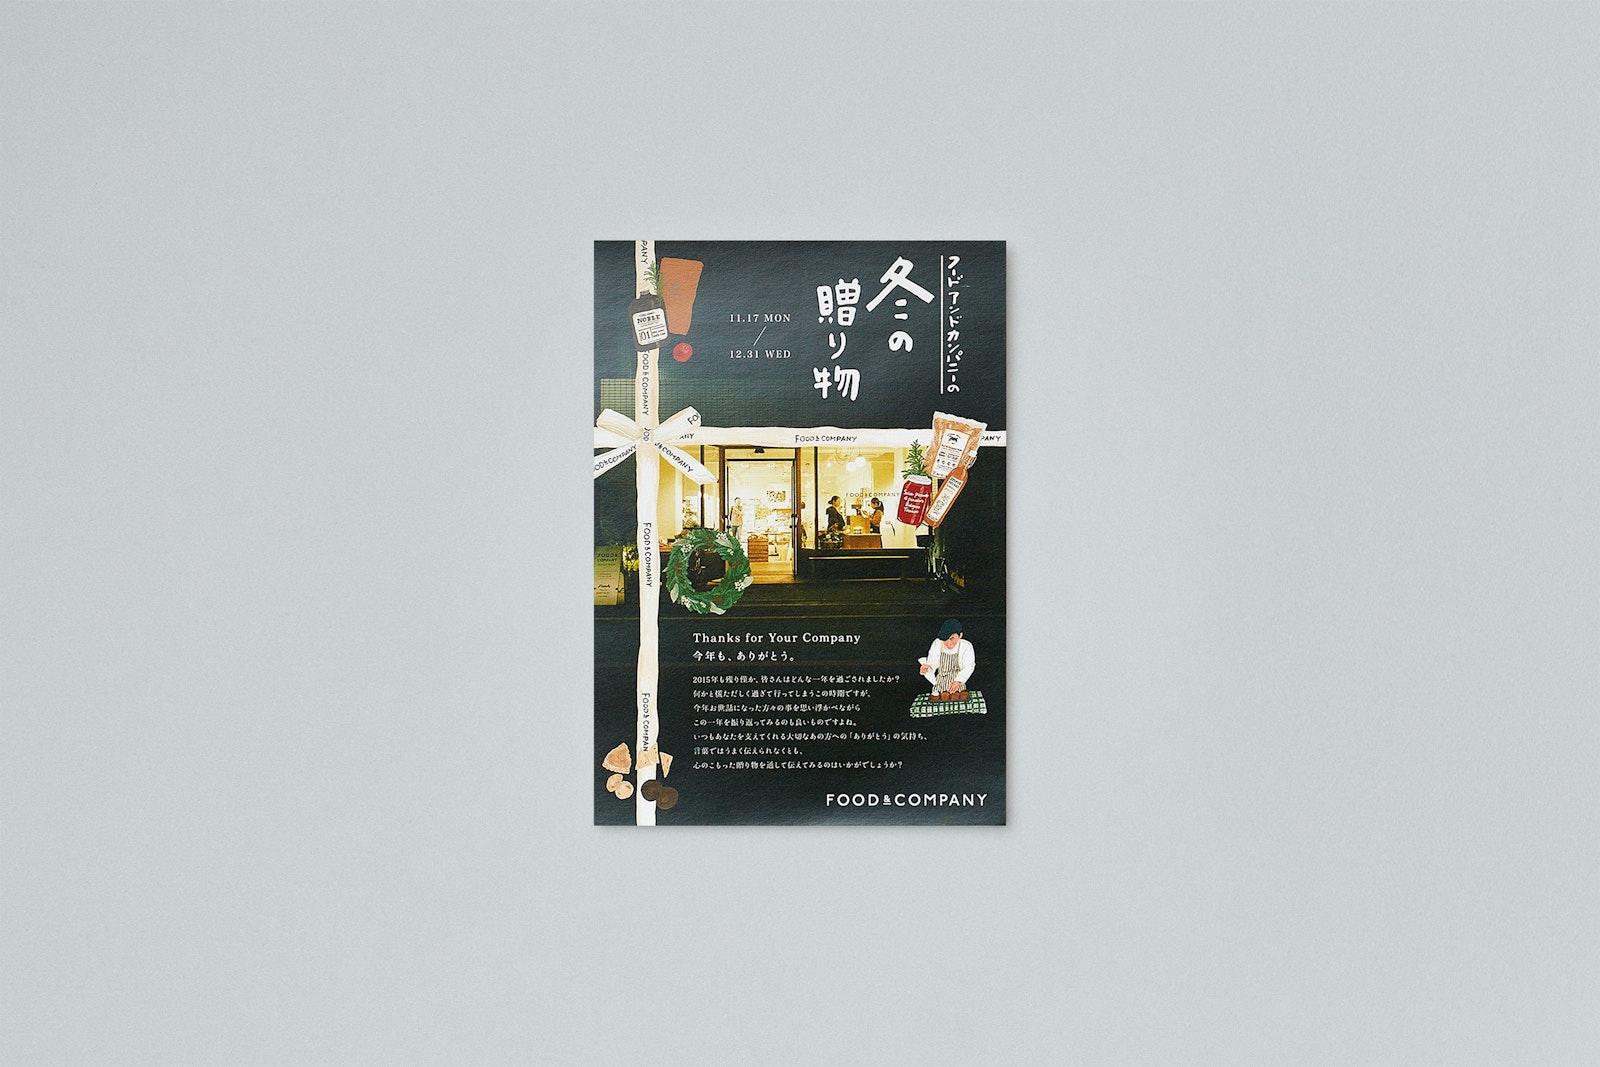 Food&Company Winter Gift